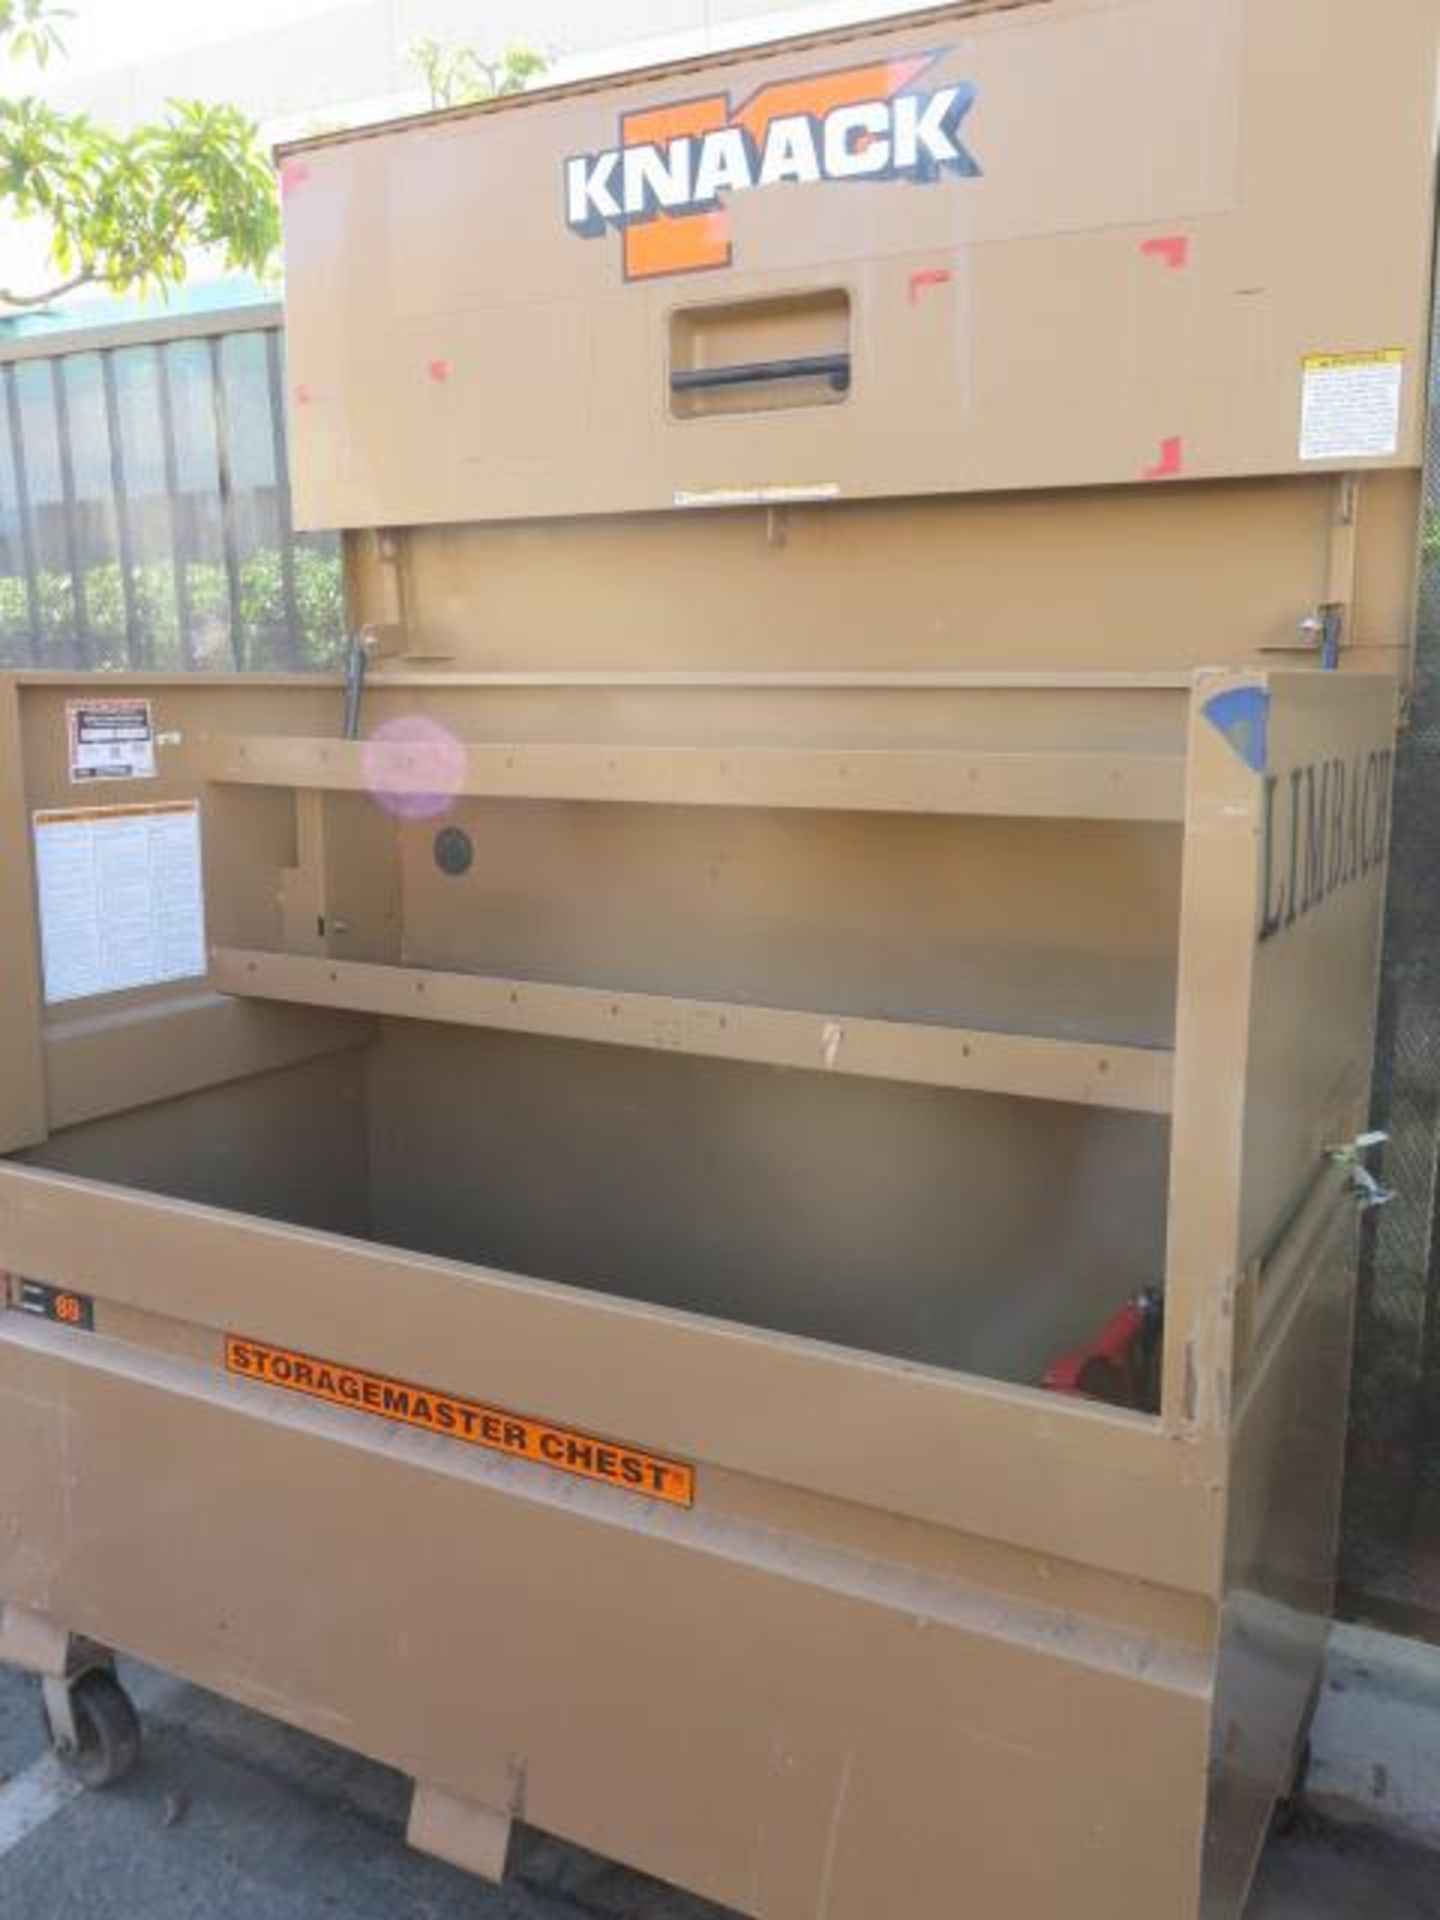 Knaack mdl. 89 Storagemaster Rolling Job Box w/ Ridgid Tri-Stands (SOLD AS-IS - NO WARRANTY) - Image 5 of 11